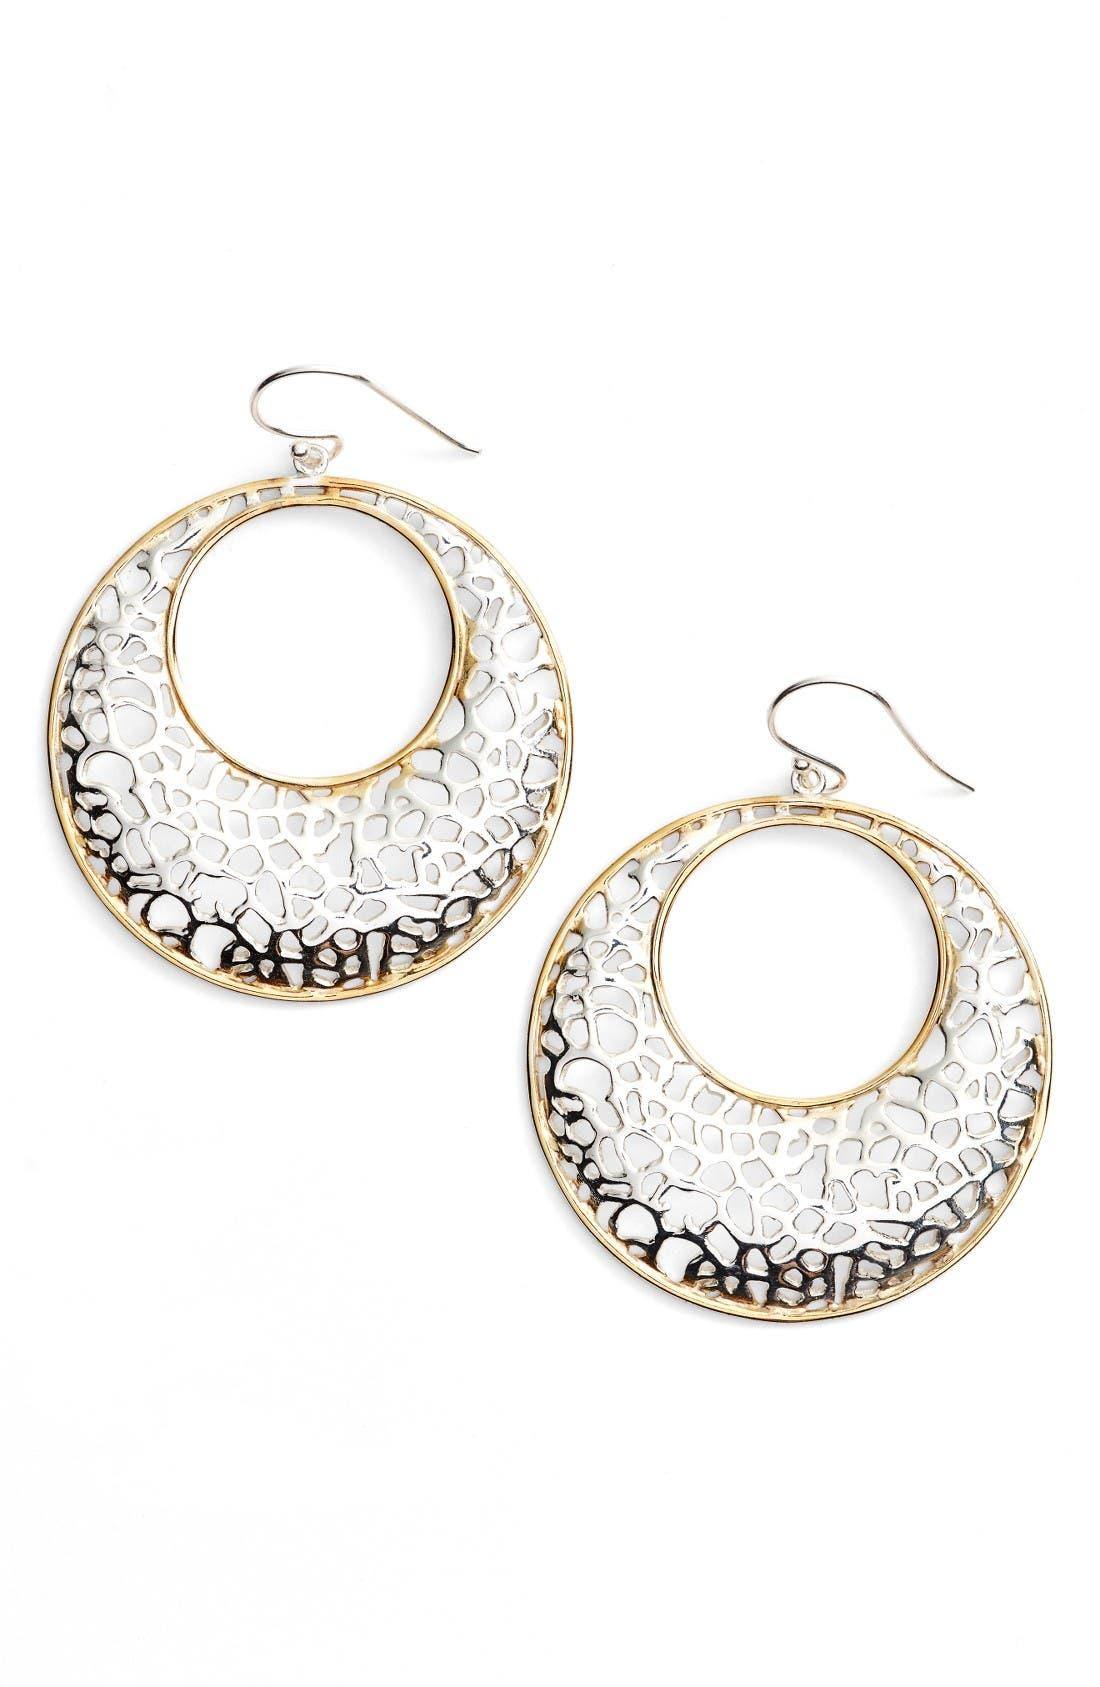 Argento Vivo Two Tone Circle Lace Earrings